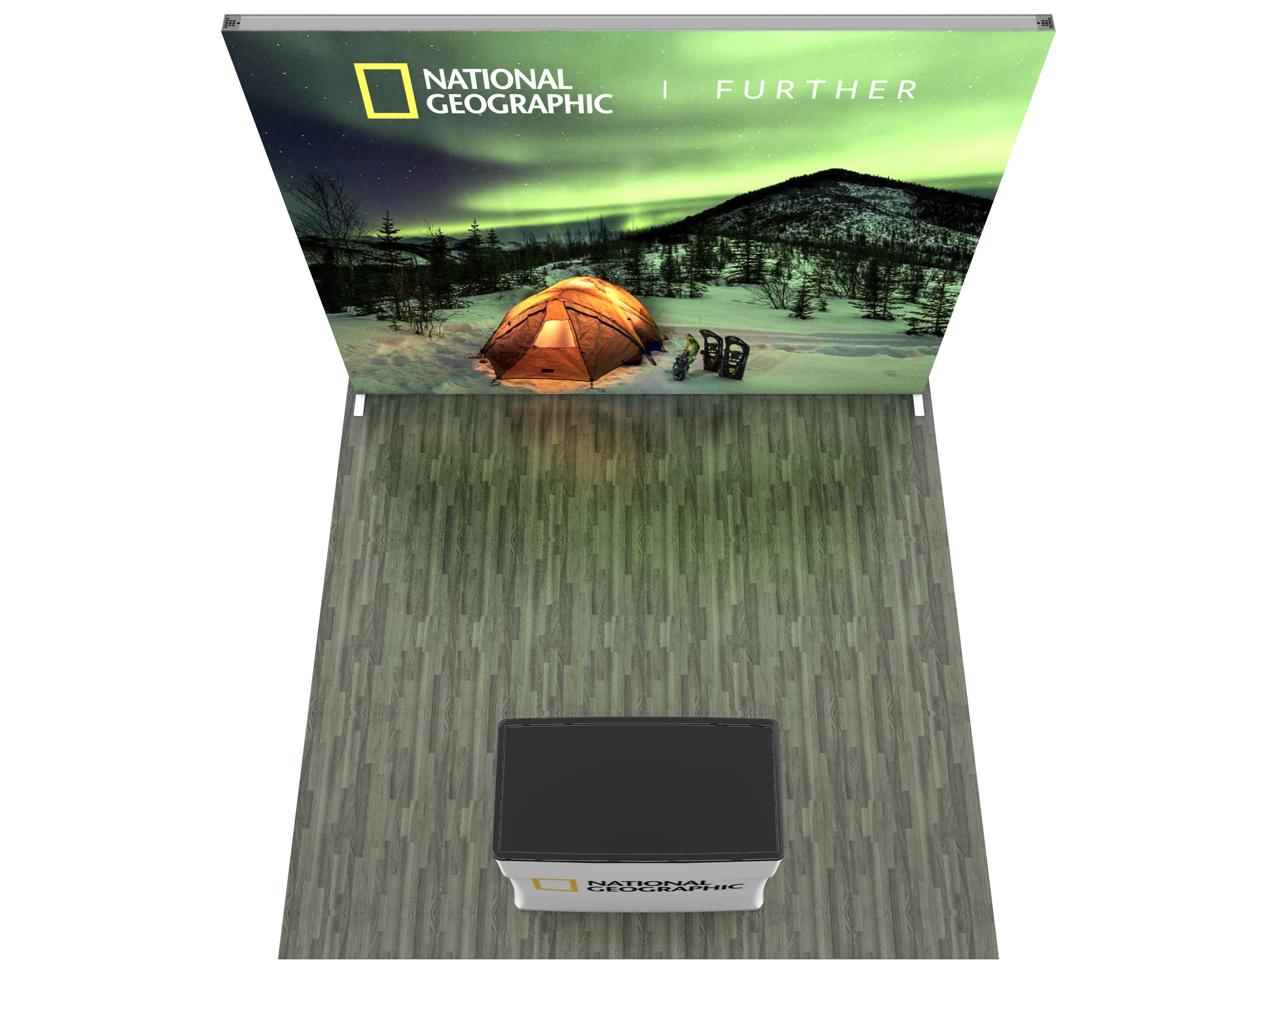 Infinity Pro Backlit 10x10 Trade Show Display Kit - 10.01